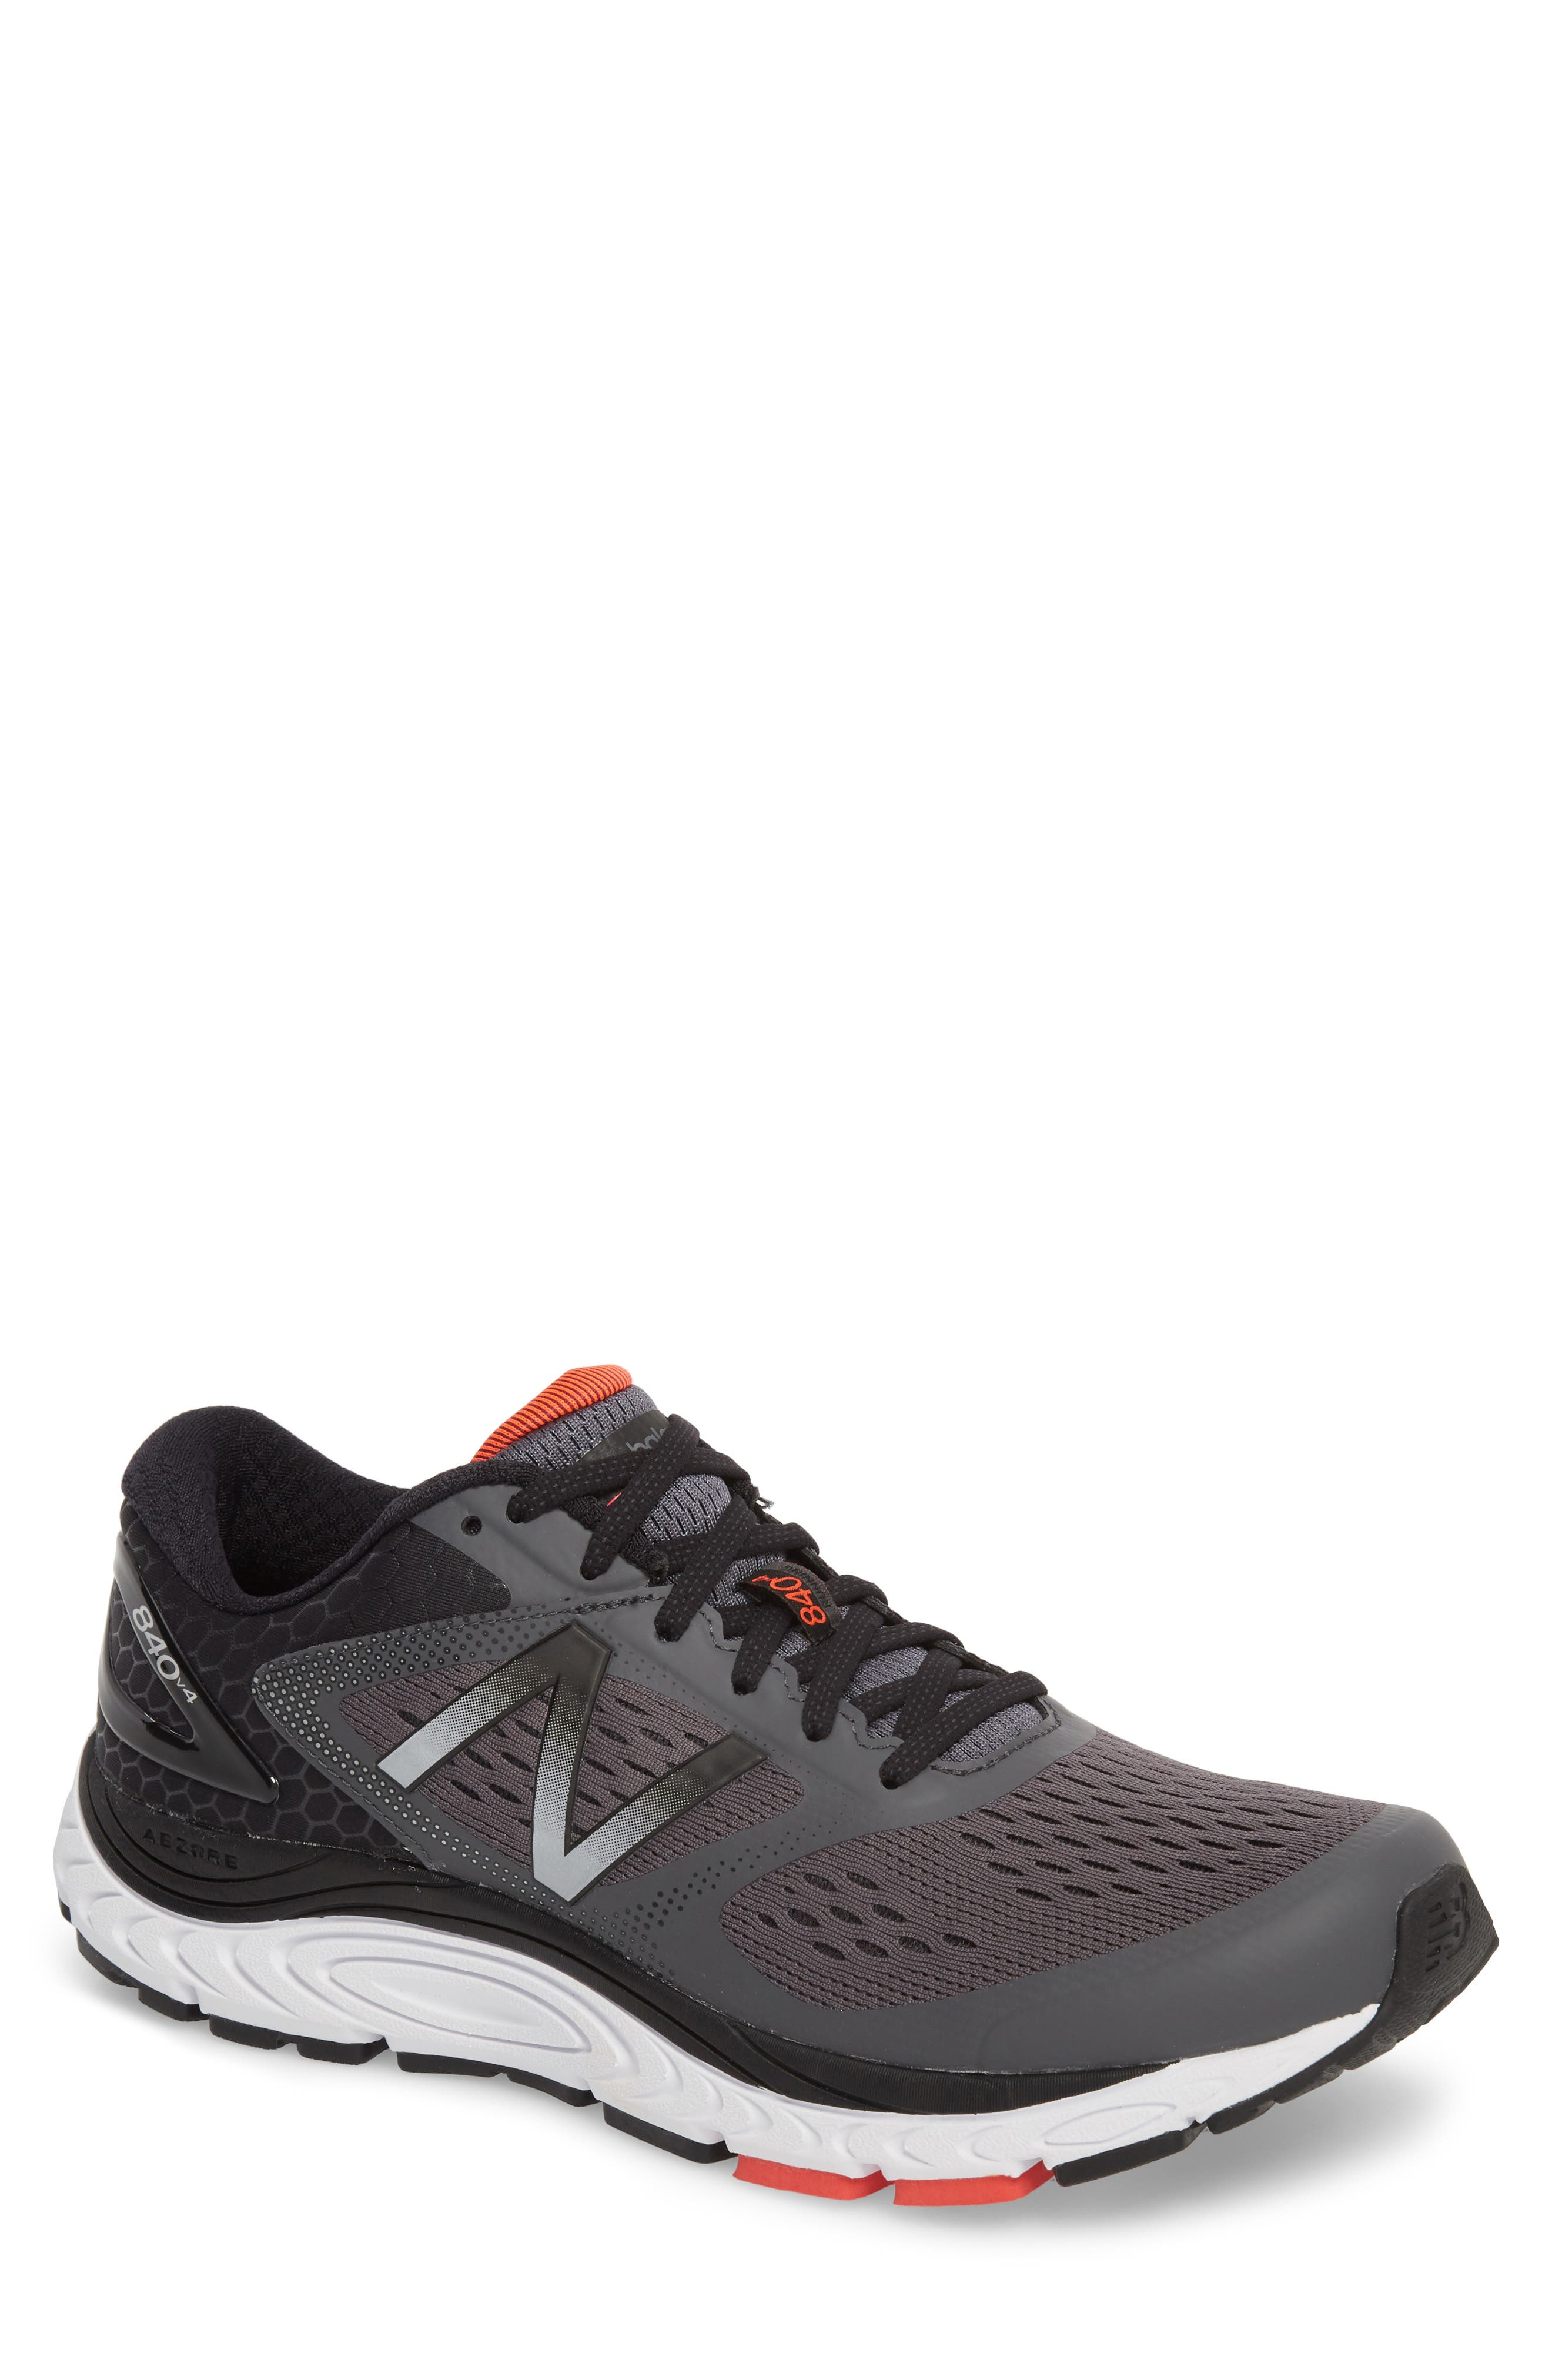 840v4 Running Shoe,                             Main thumbnail 1, color,